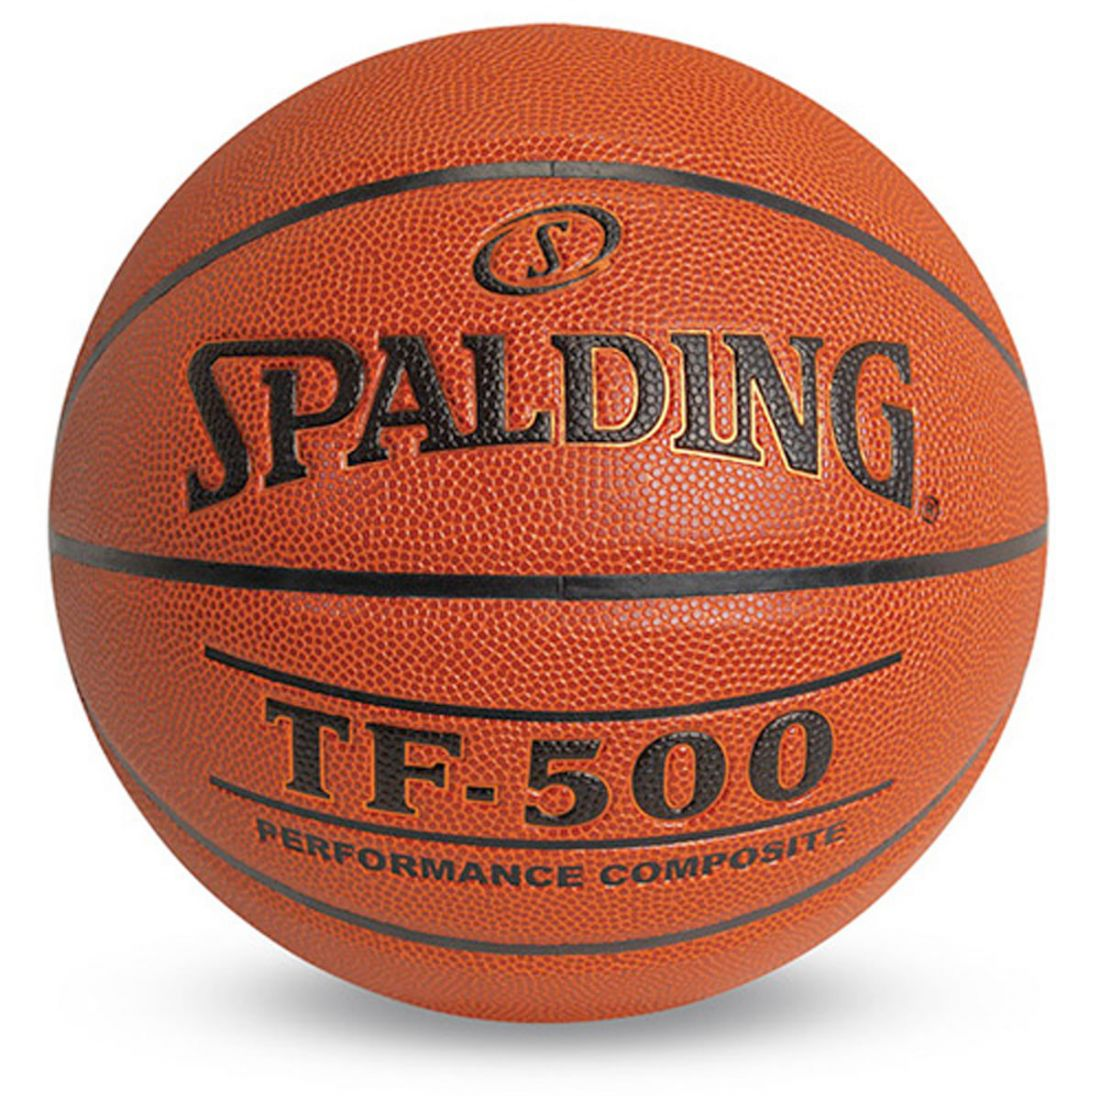 Мяч баскетбольный Spalding TF-500 р-р 6 (74-529)